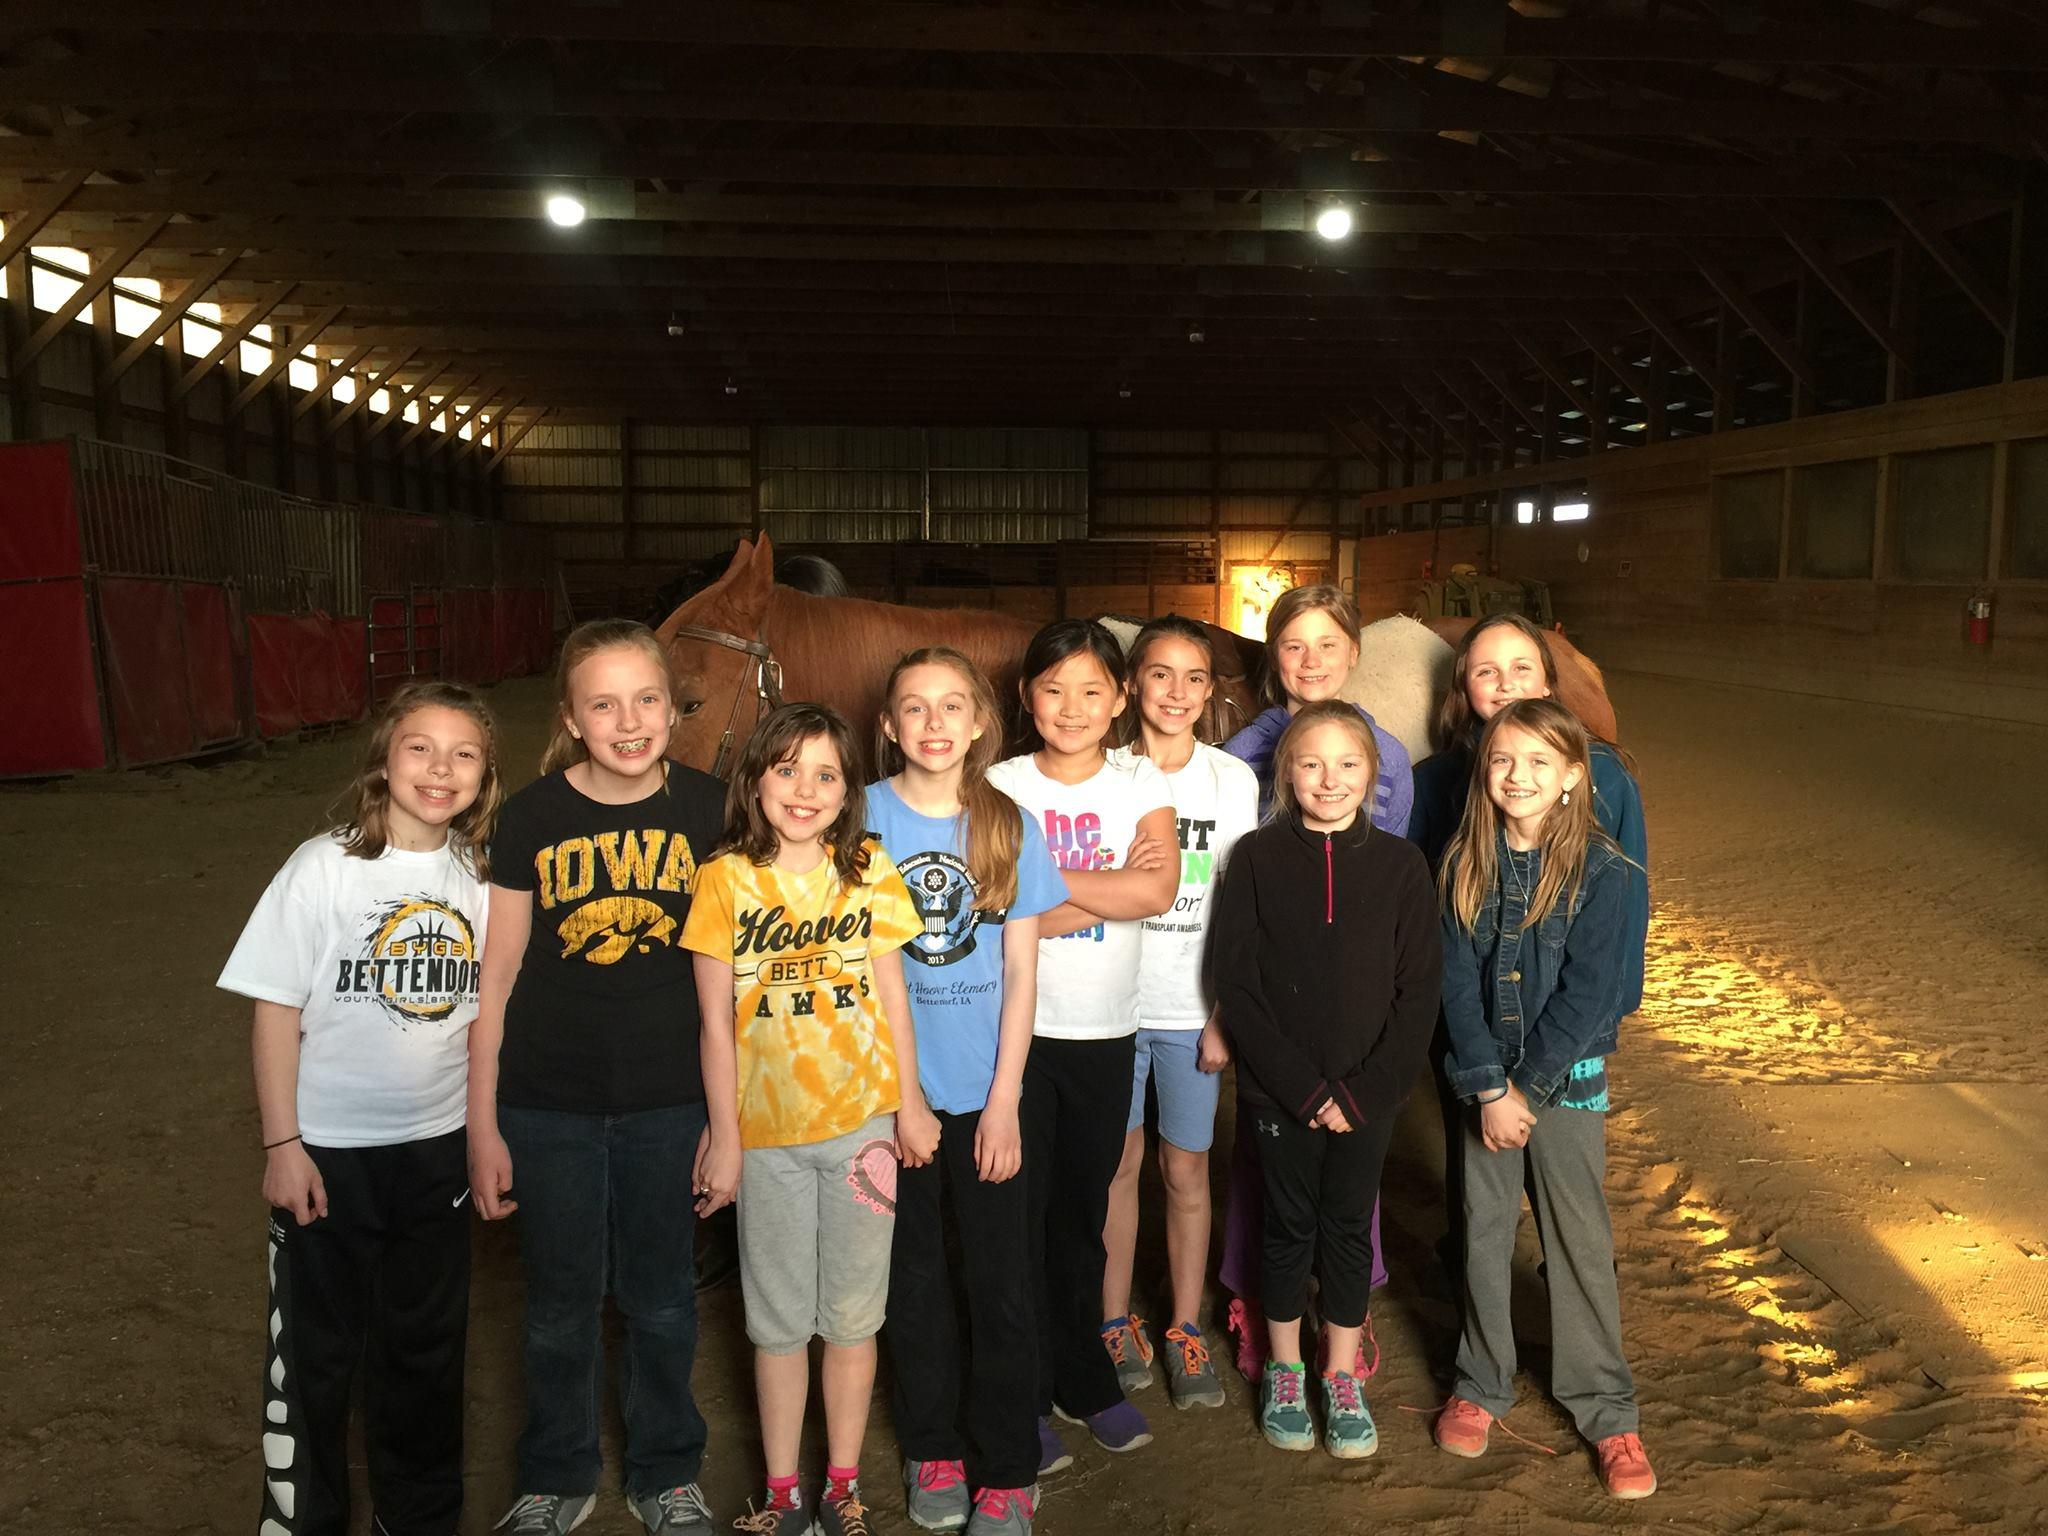 Wright-Way Equestrian Center Inc. image 8